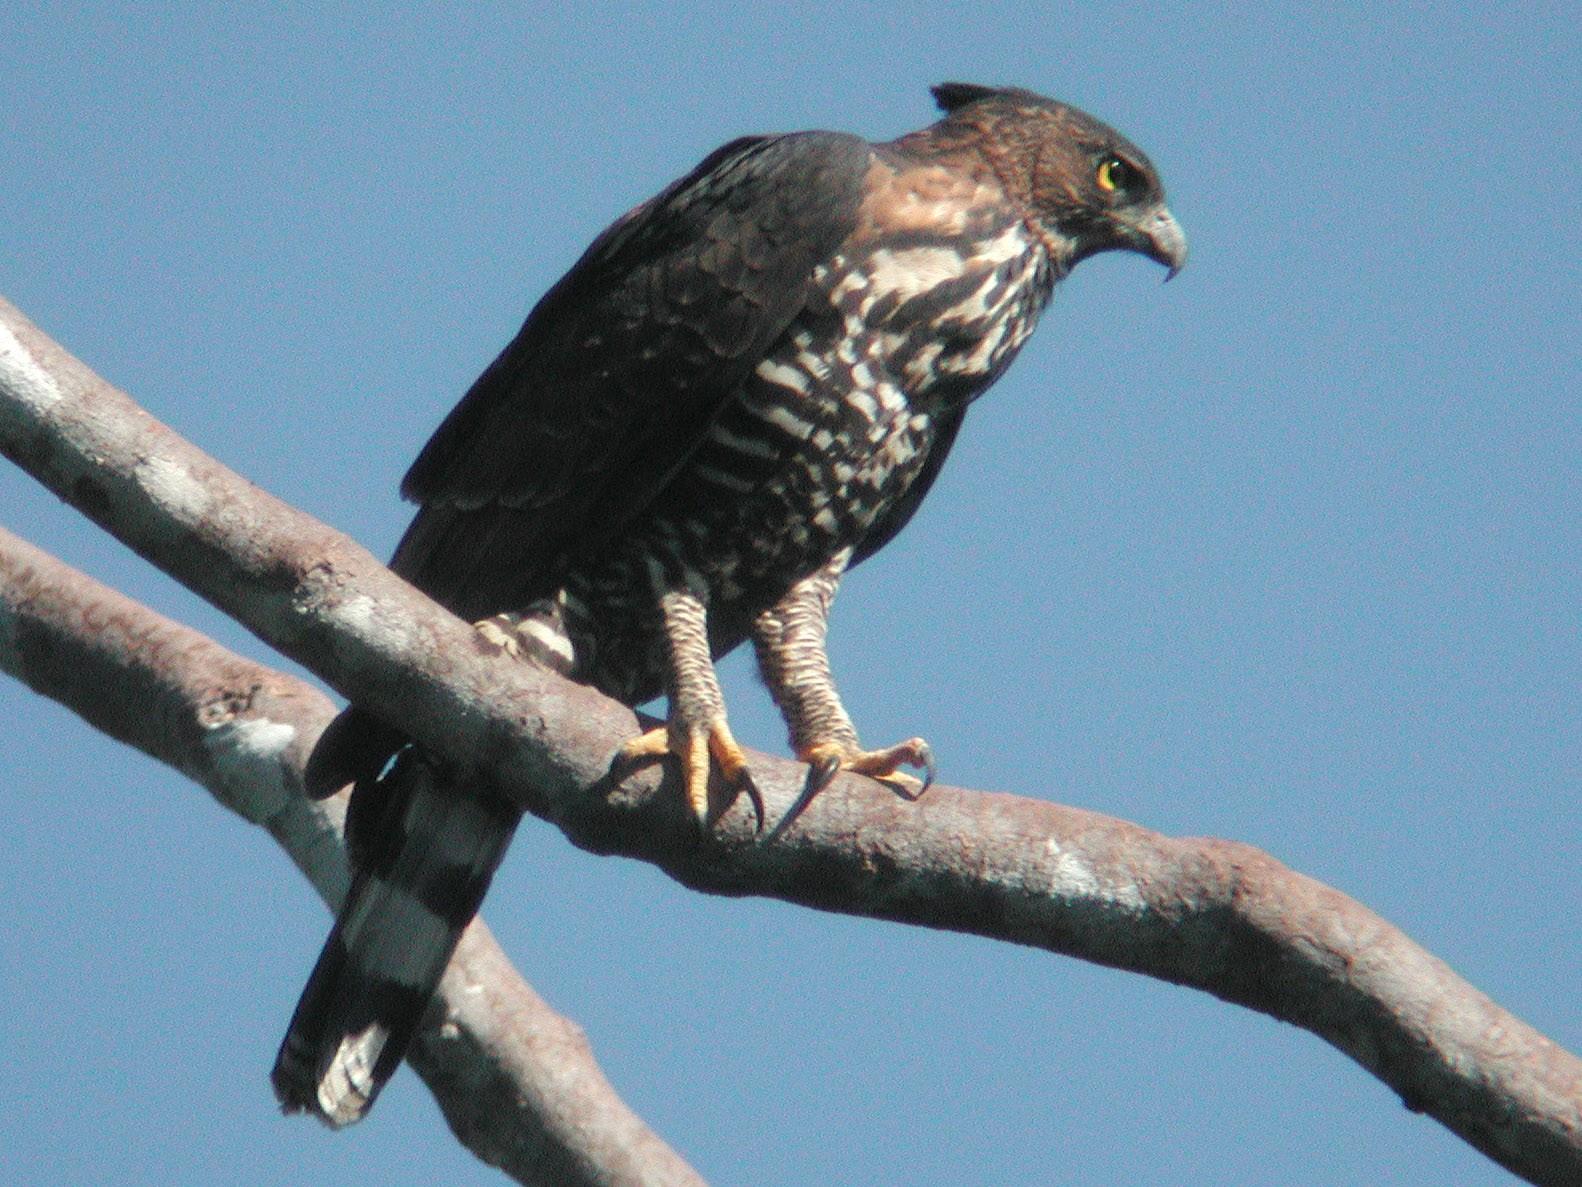 Wallace's Hawk-Eagle - Neoh Hor Kee